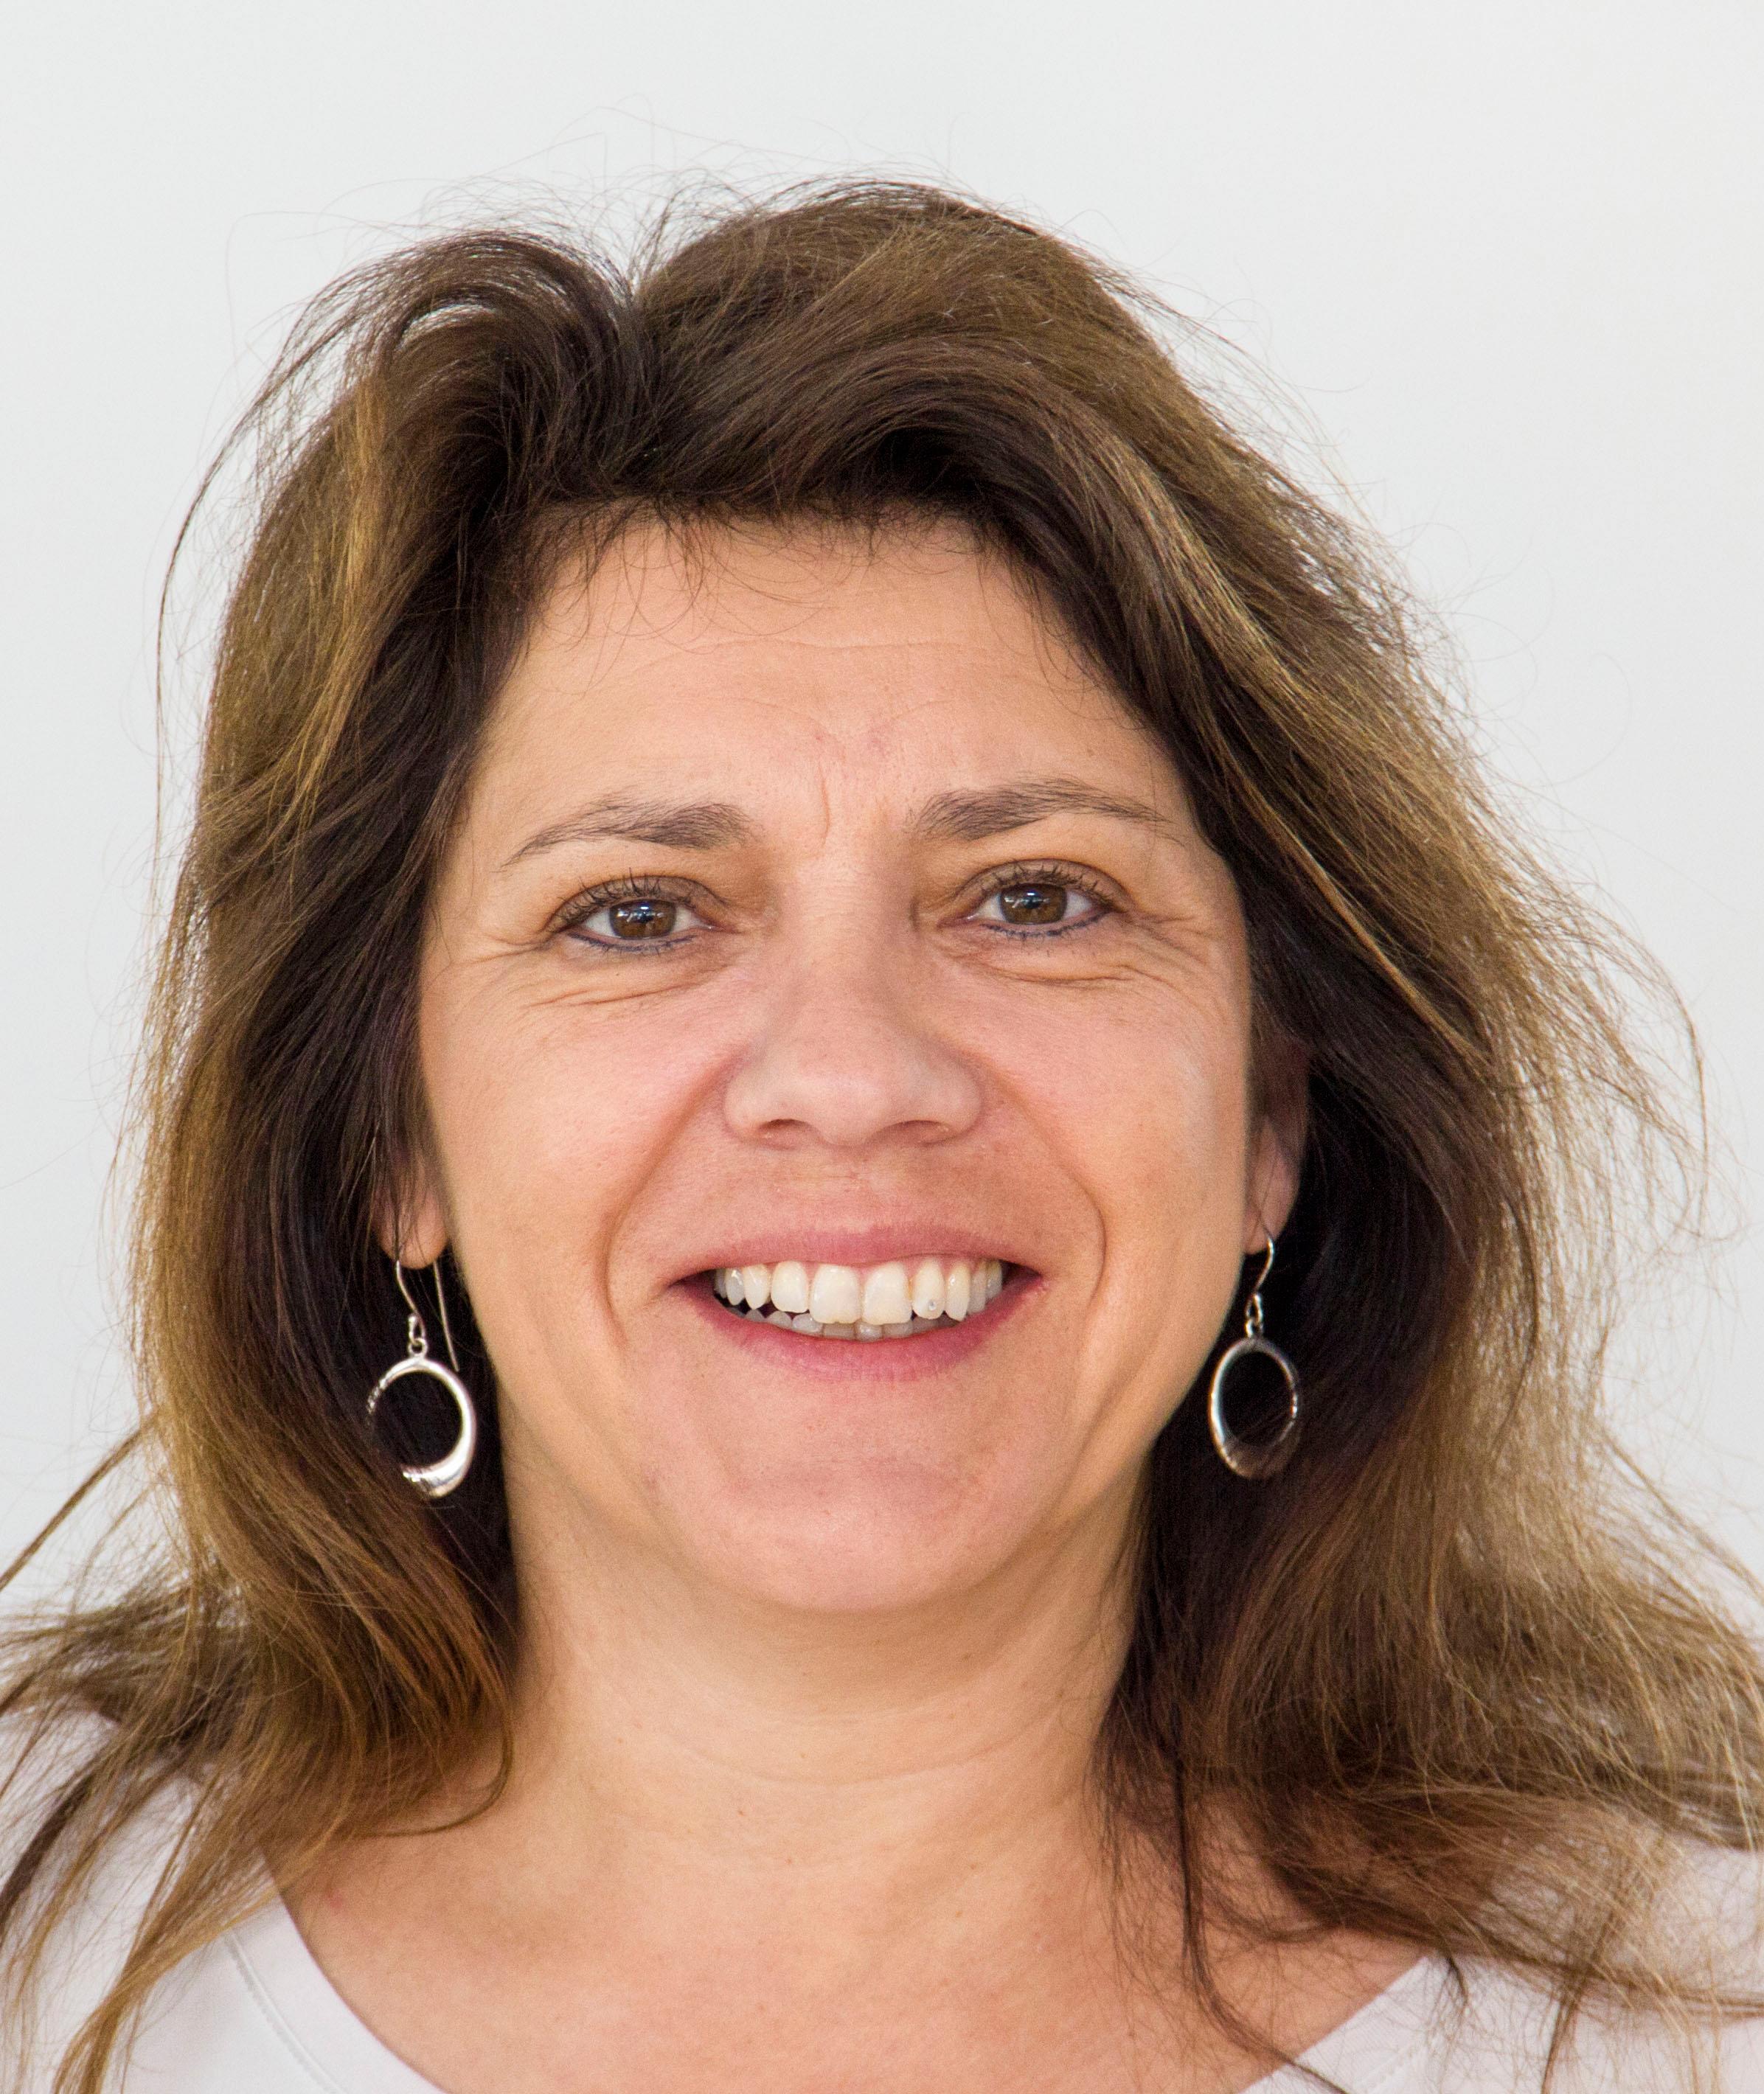 Conrnelia Chaguaceda - Wenger